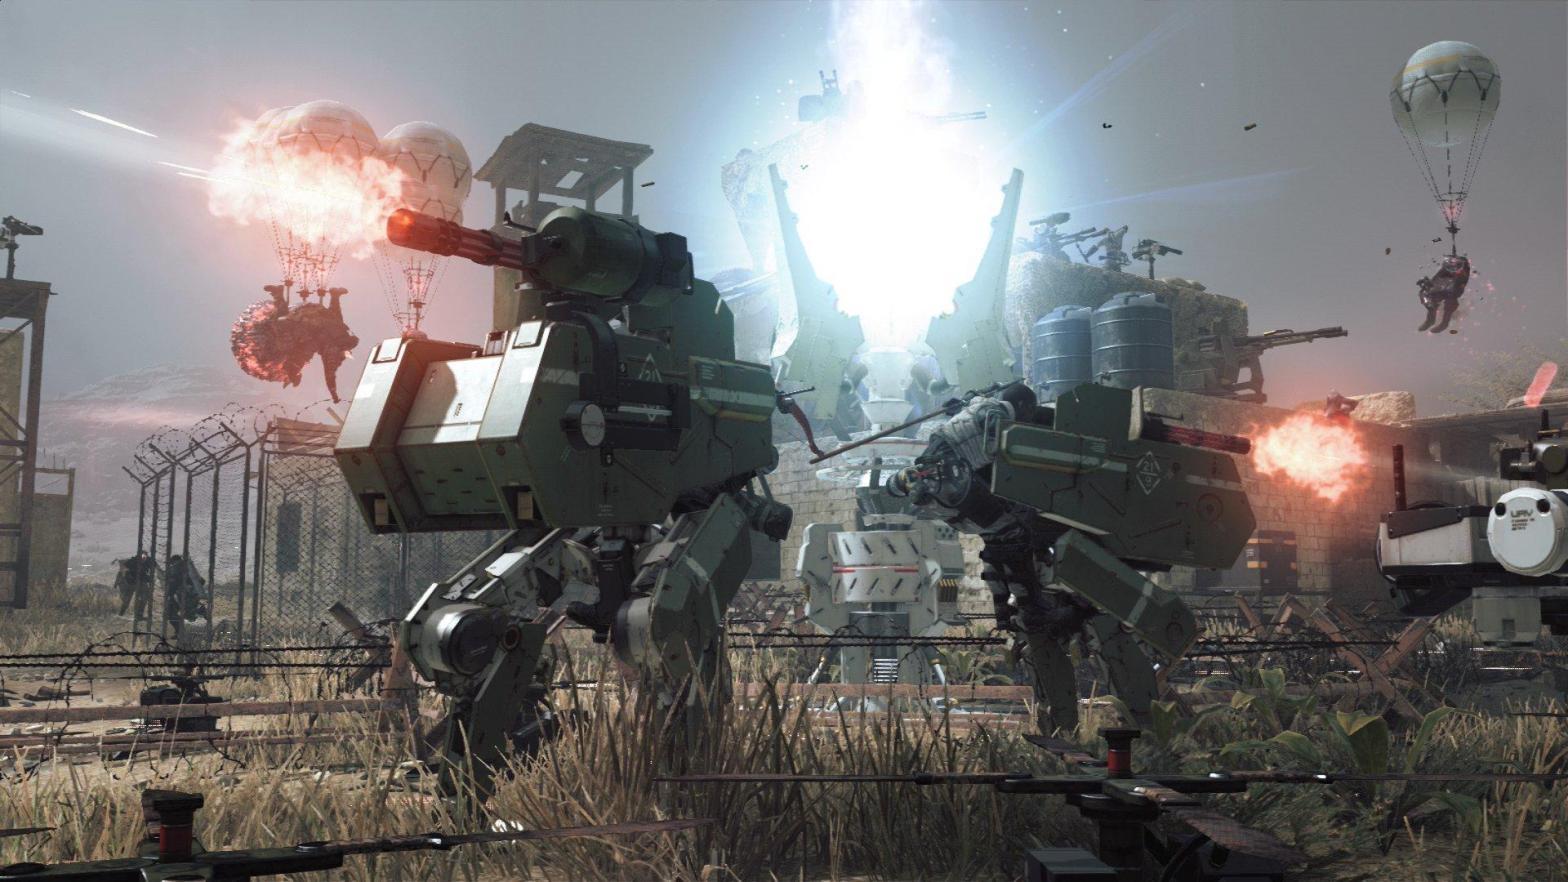 Metal Gear Survive, Games, Online Games, Video Games